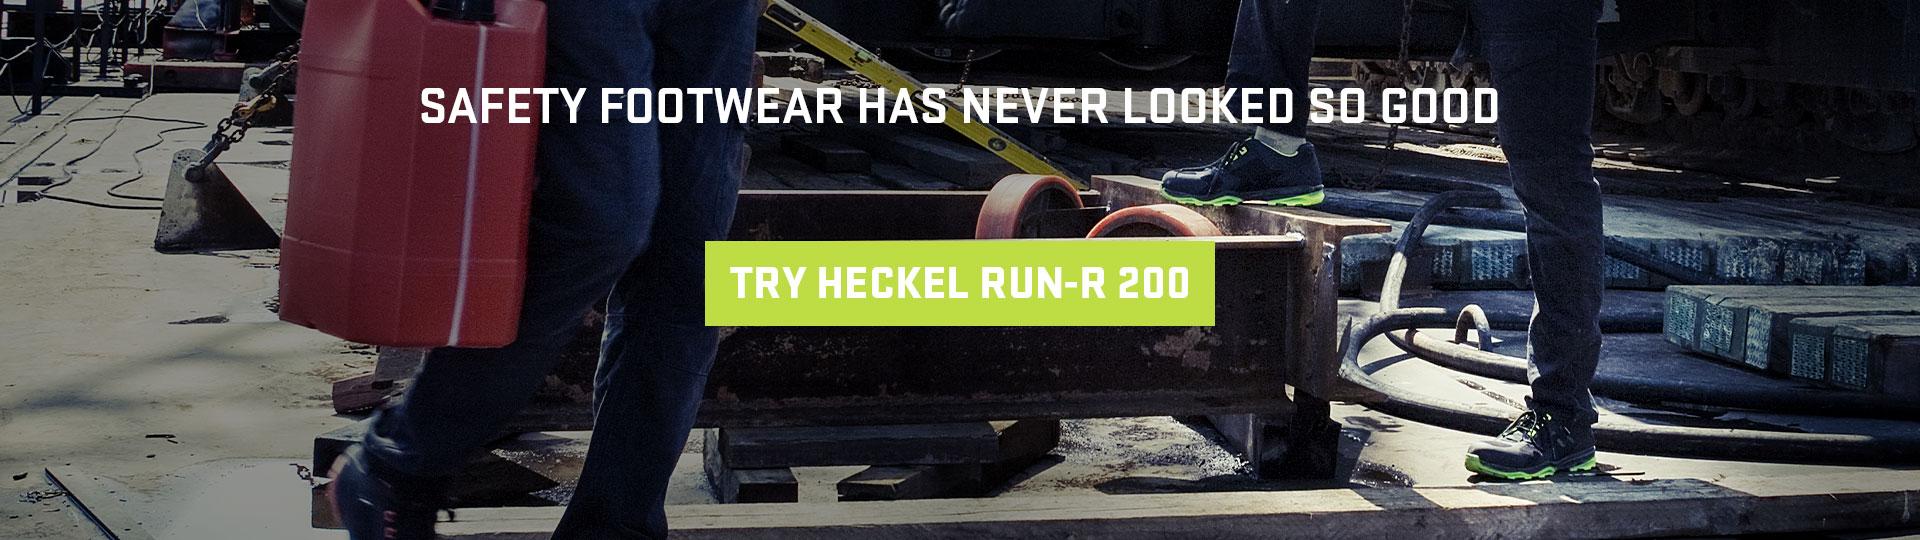 Try Heckel Run-R 200